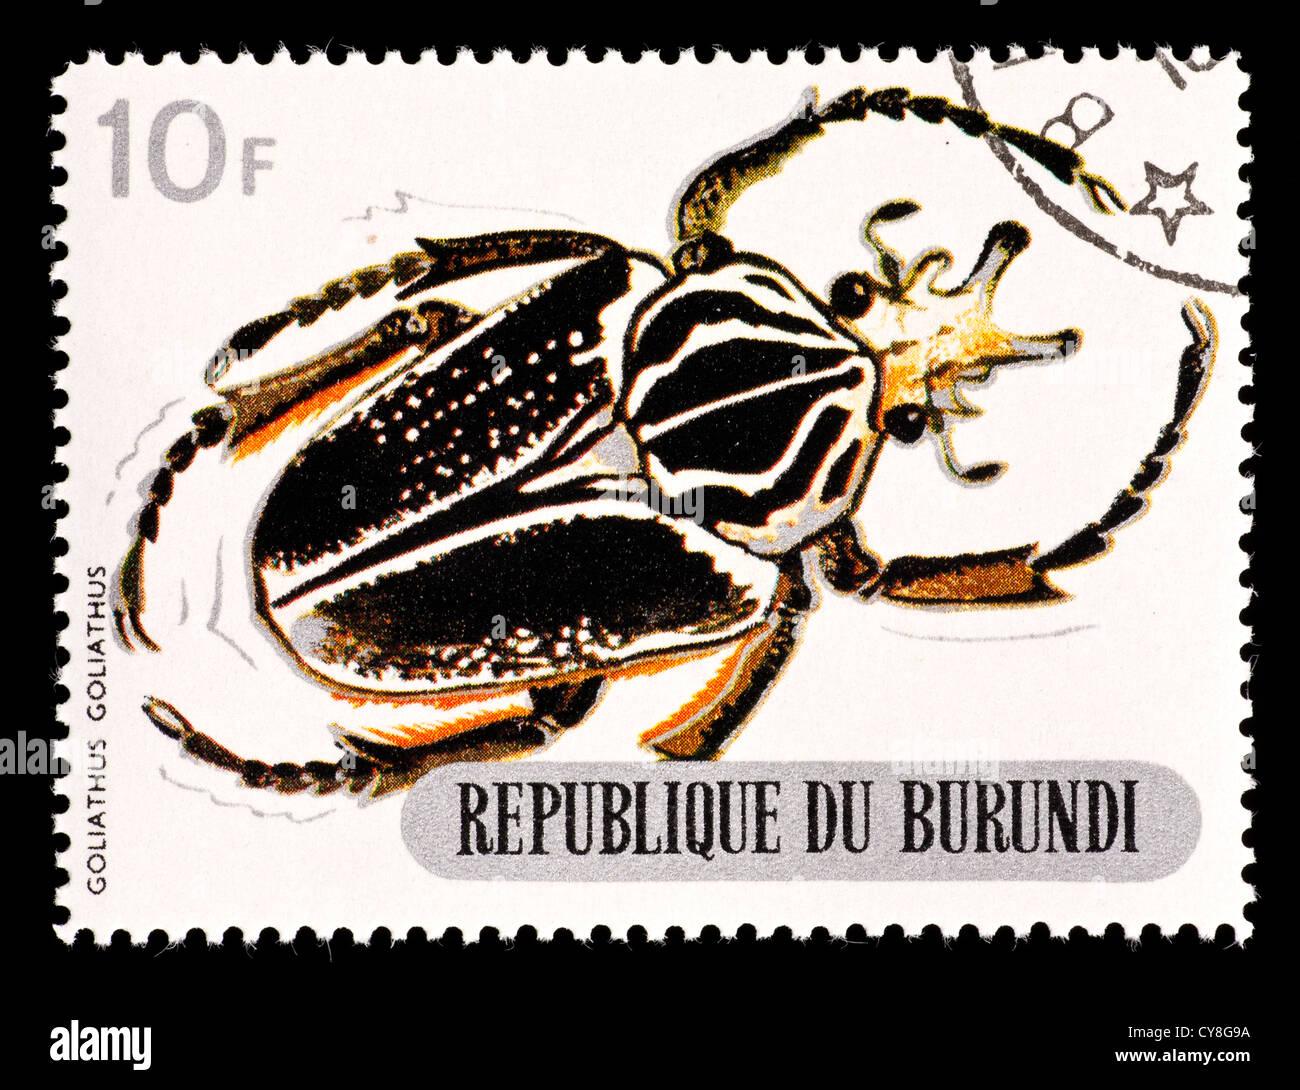 Postage stamp from Burundi depicting a goliath scarab beetle (Goliathus goliathus) Stock Photo